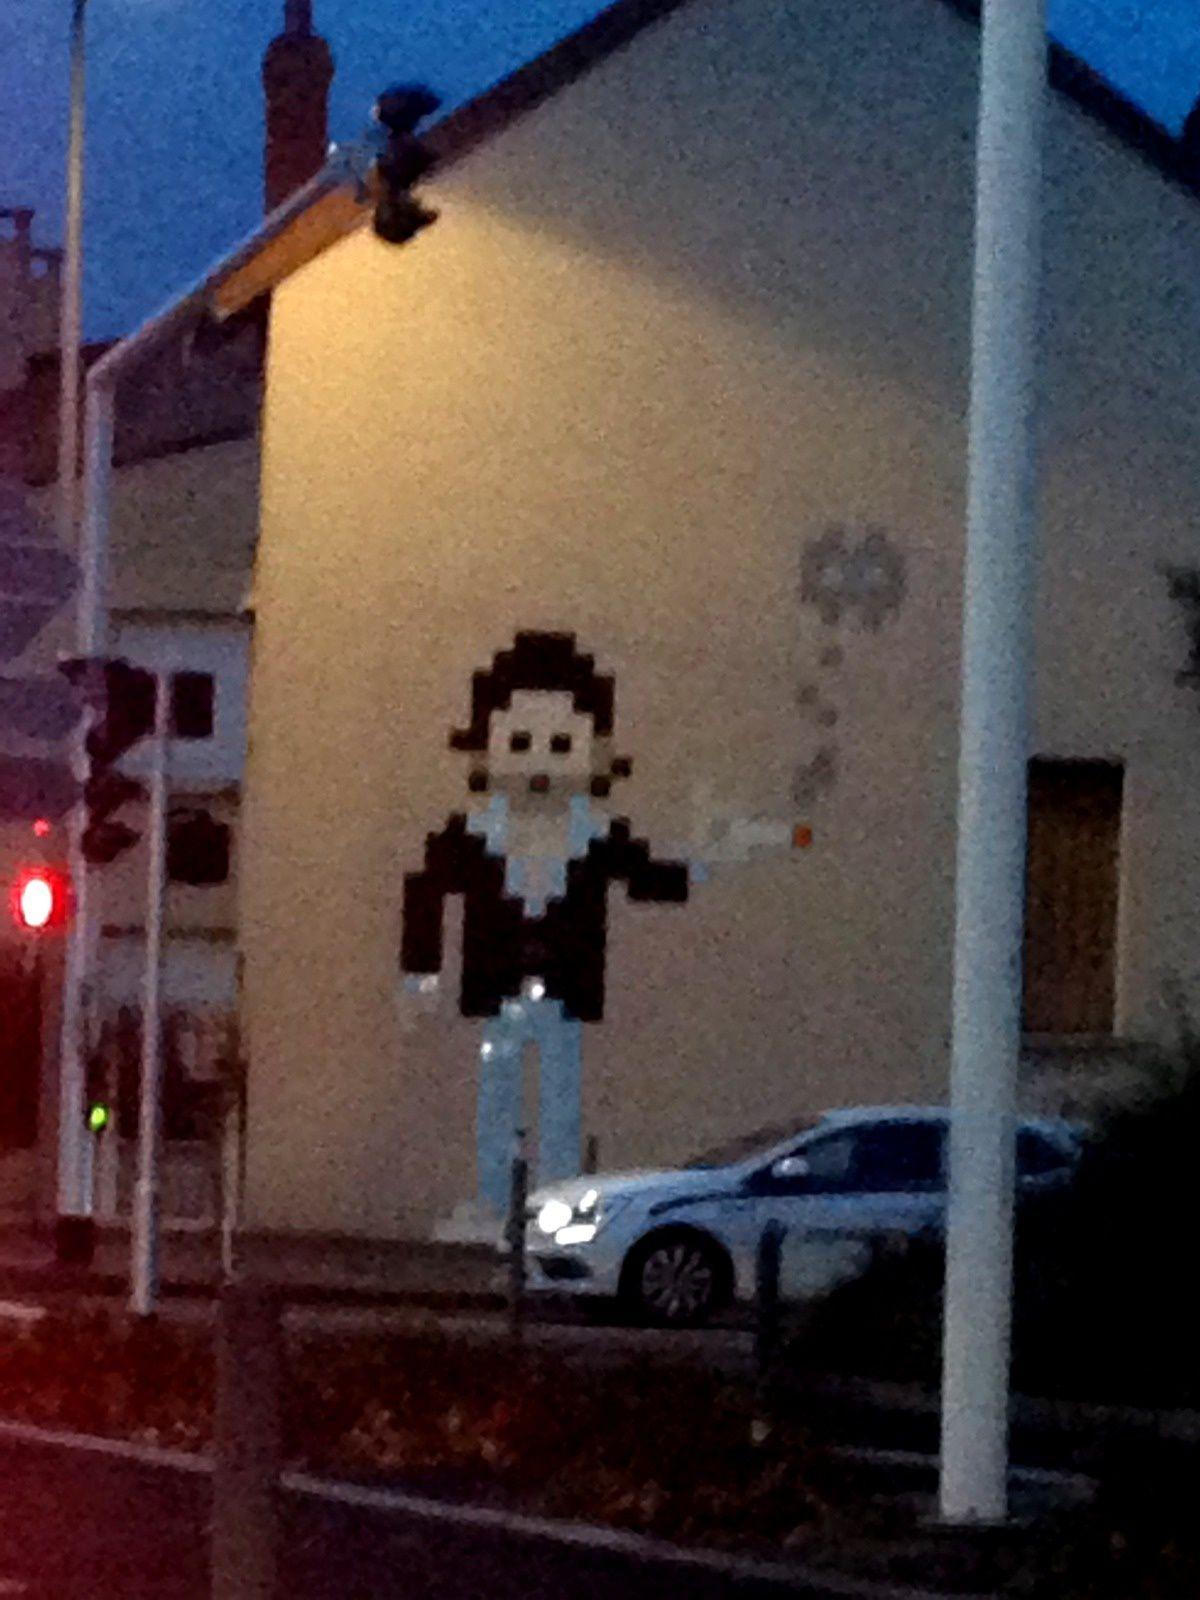 #Spaceinvaders #streetart #clermontferrand #charlotteblabla blog*